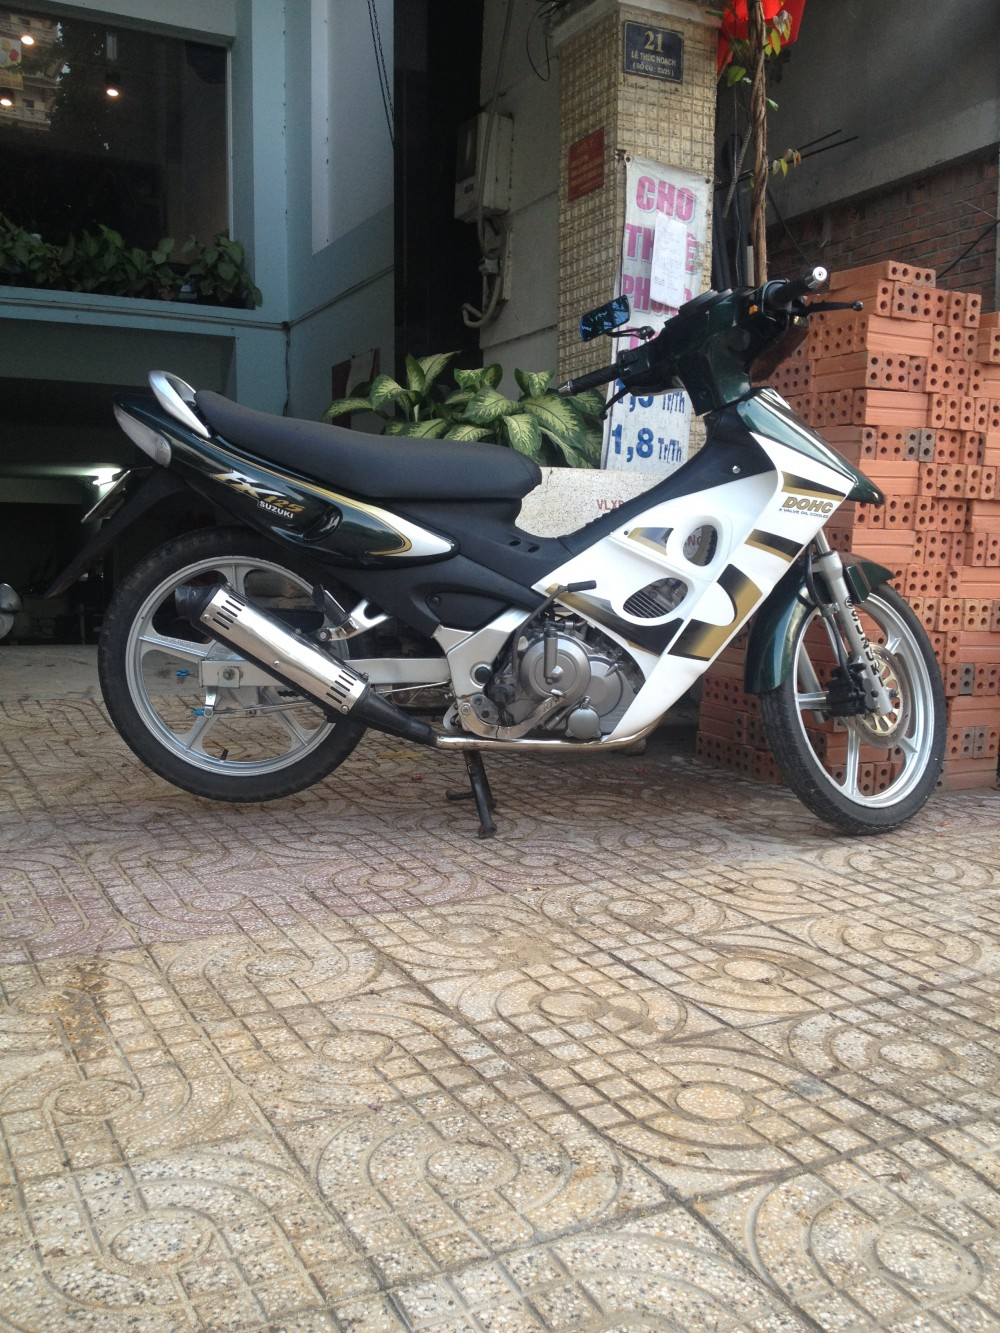 TPHCM FX 125 cc BSTP mau xanh - 3